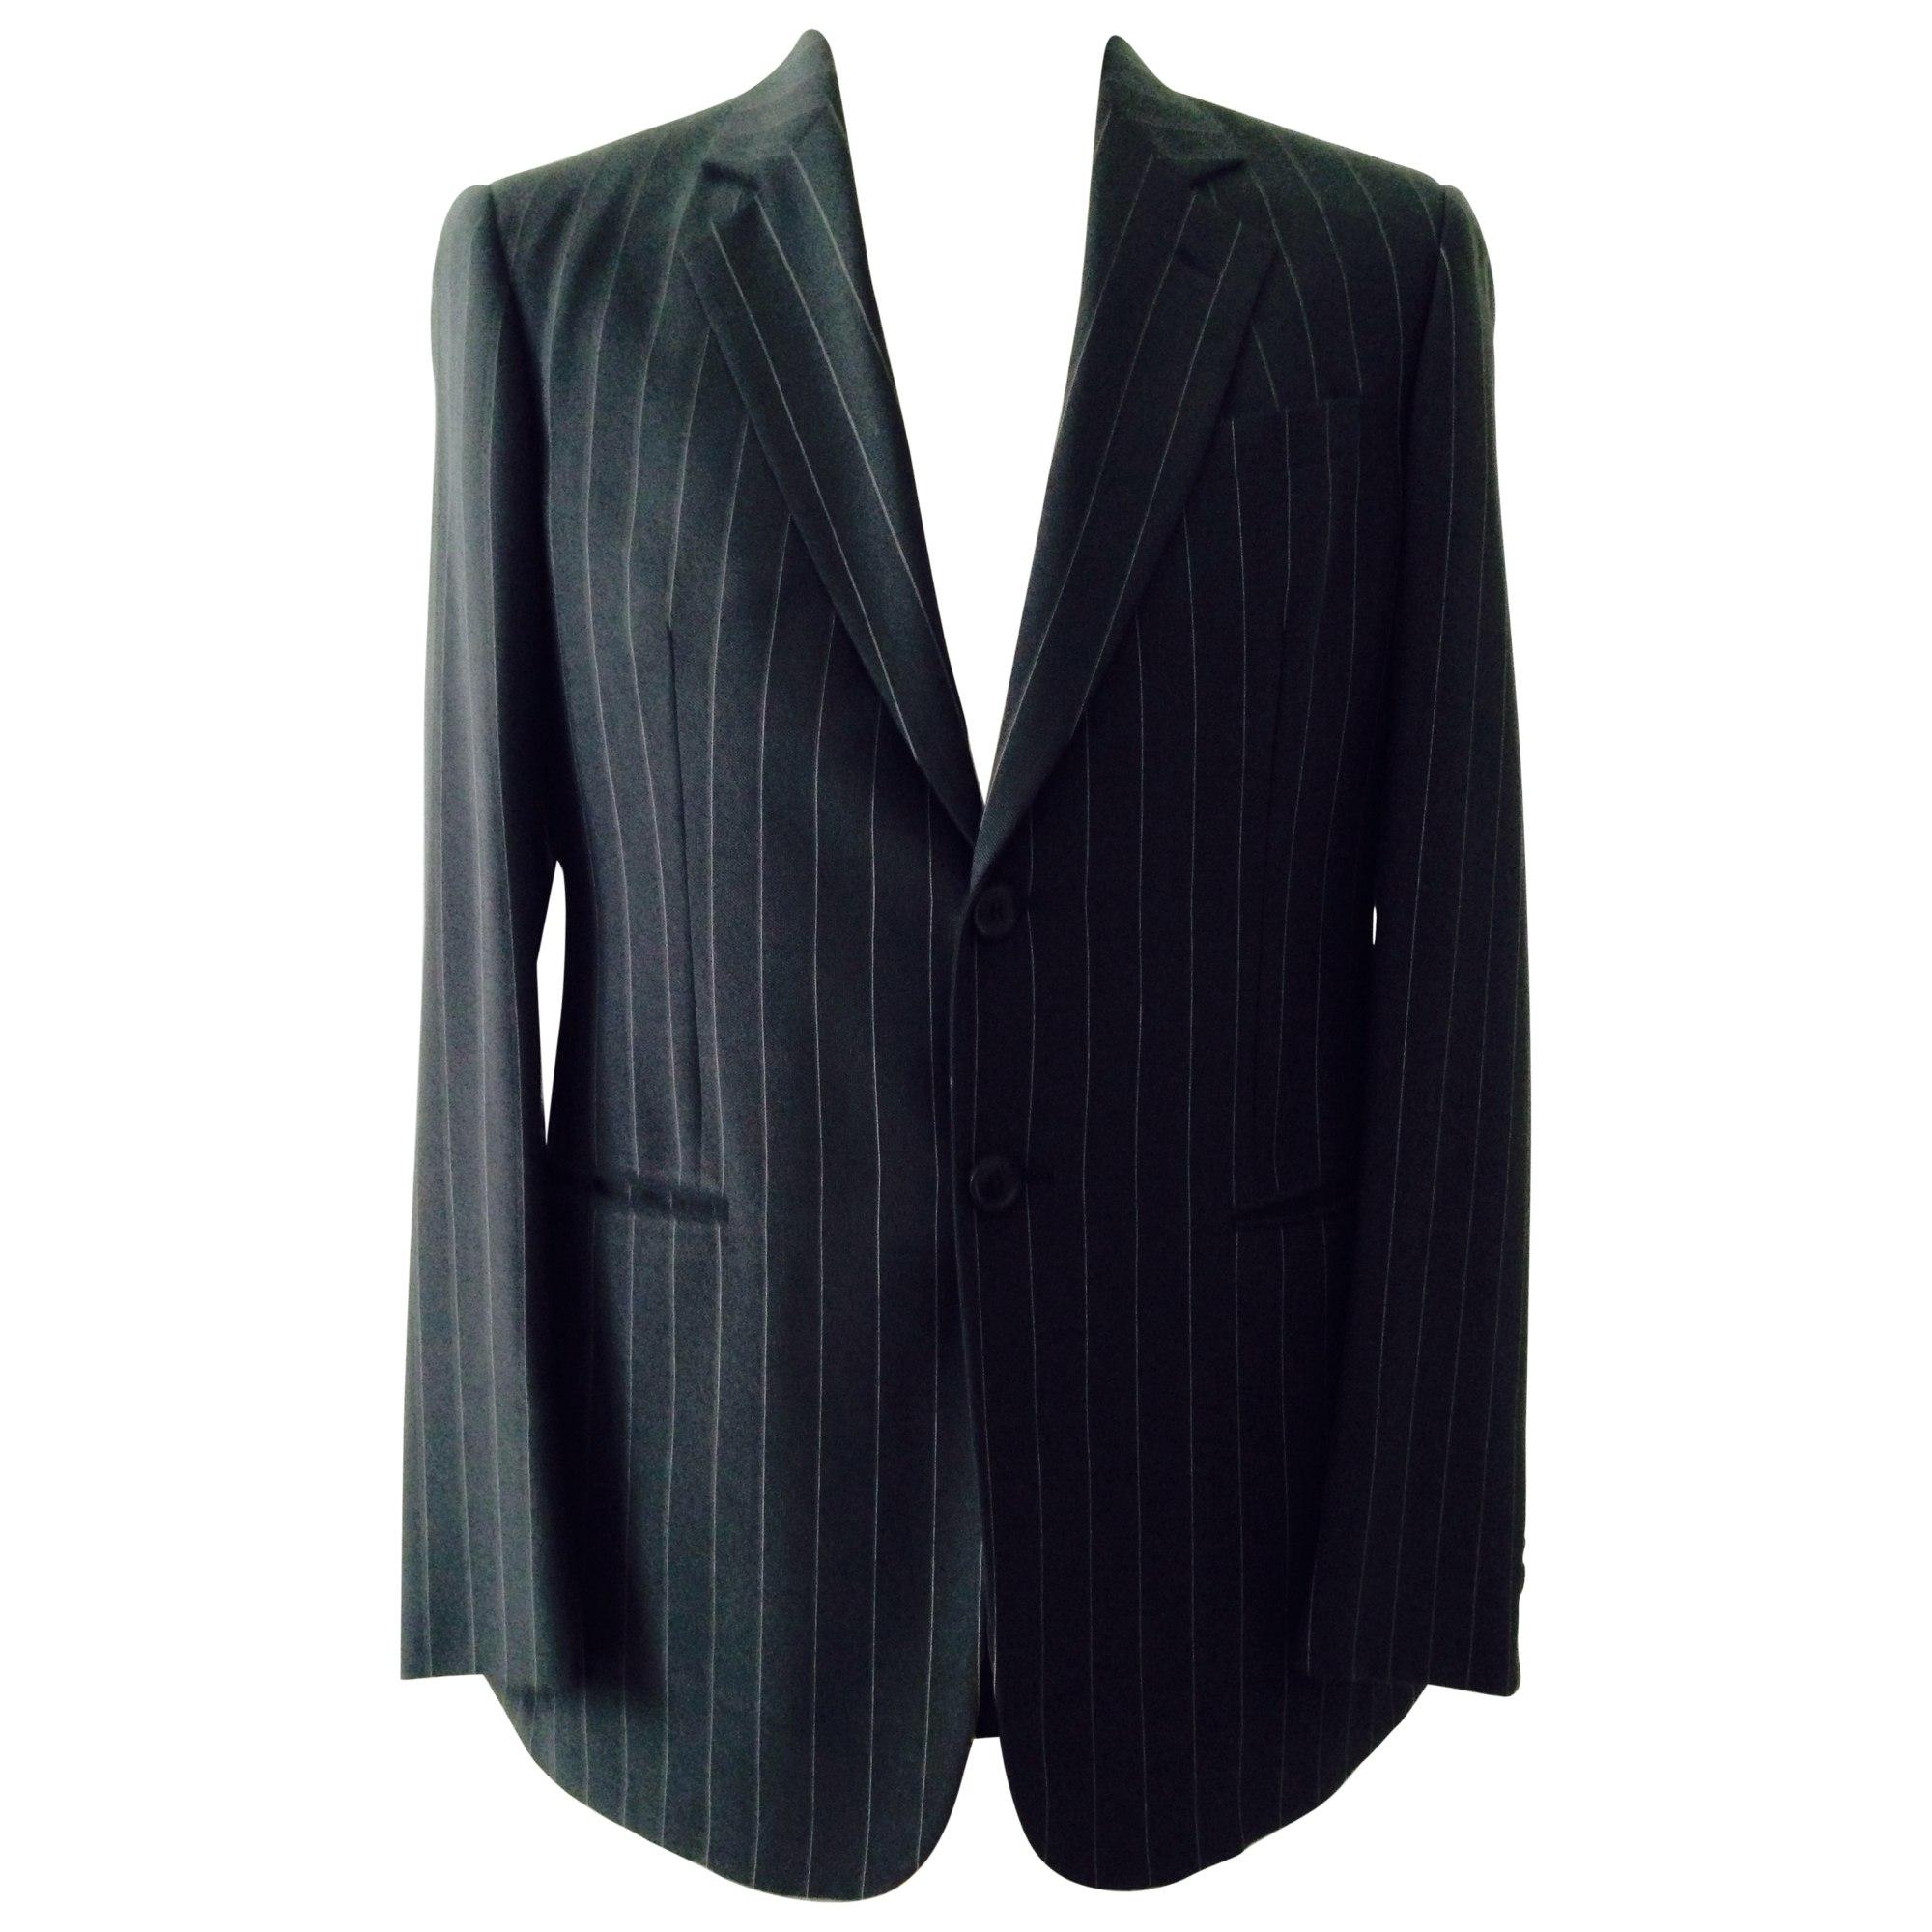 acf95d47cc6 Costume complet GIORGIO ARMANI 50 (M) gris - 3951177